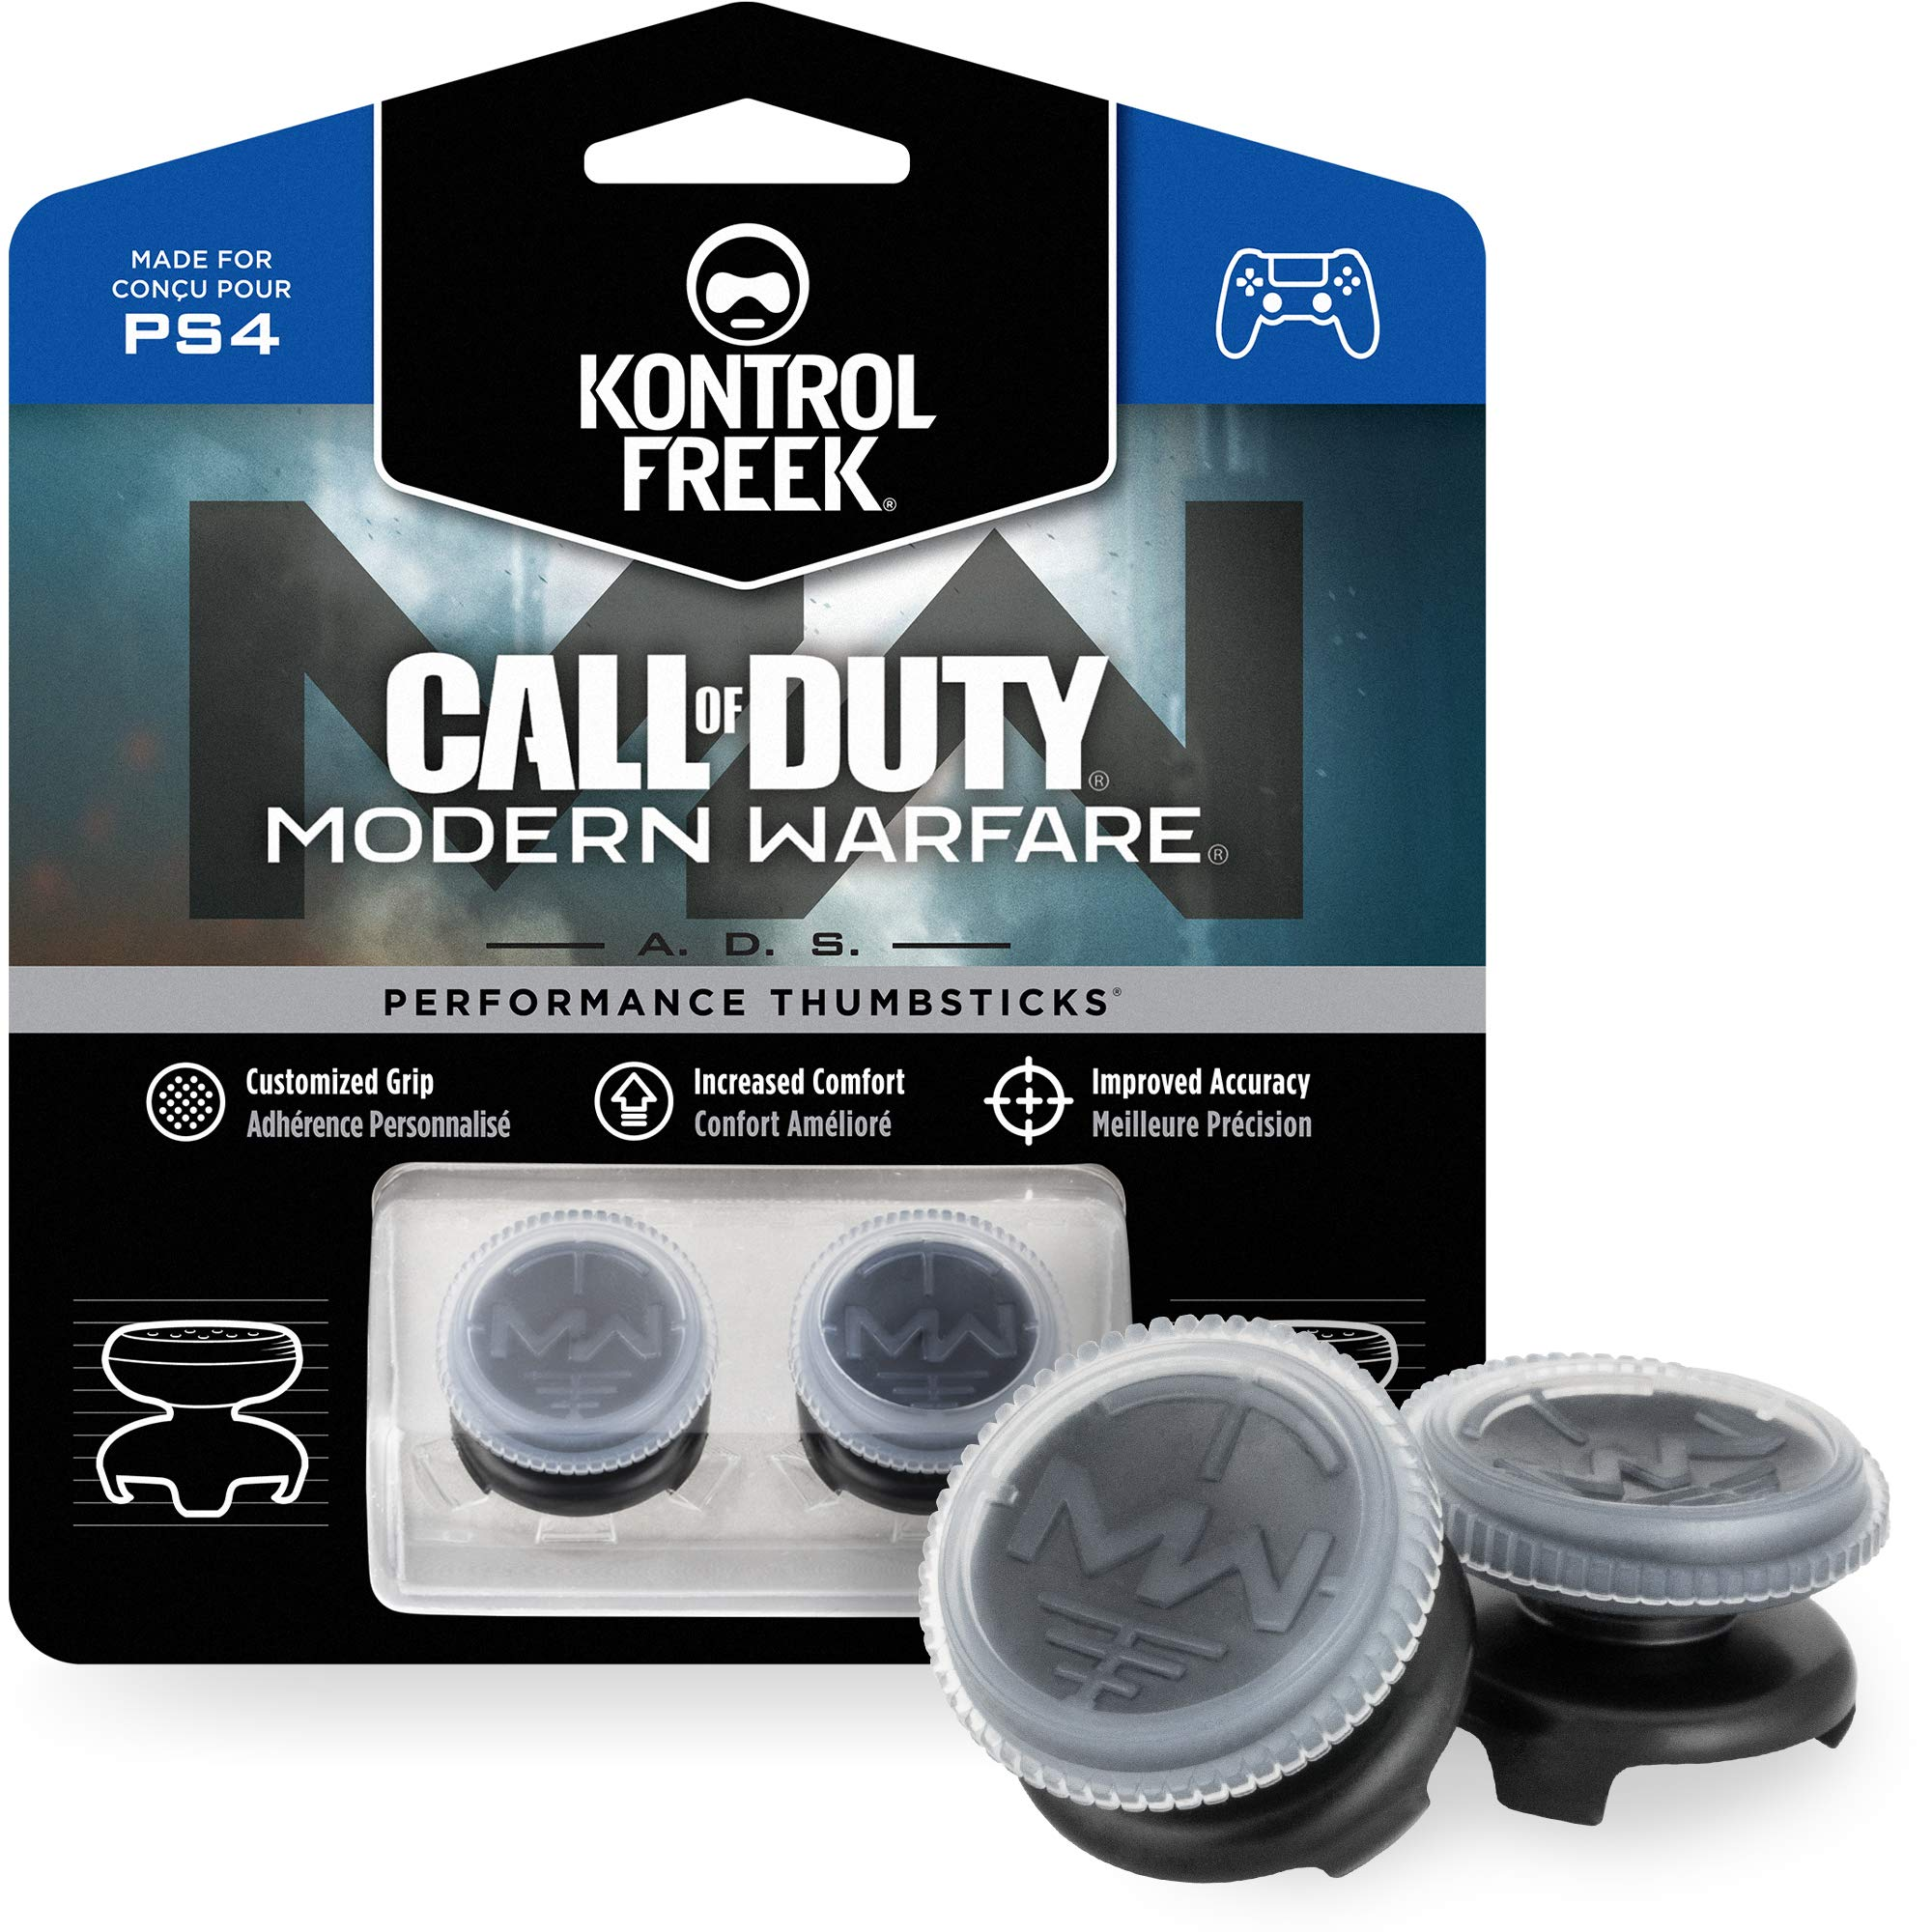 KontrolFreek Call of Duty: Modern Warfare – A.D.S. Joysticks Performance pour Manette PlayStation 4 (PS4) | 2 High-Rise, Concave | Transparent/Black